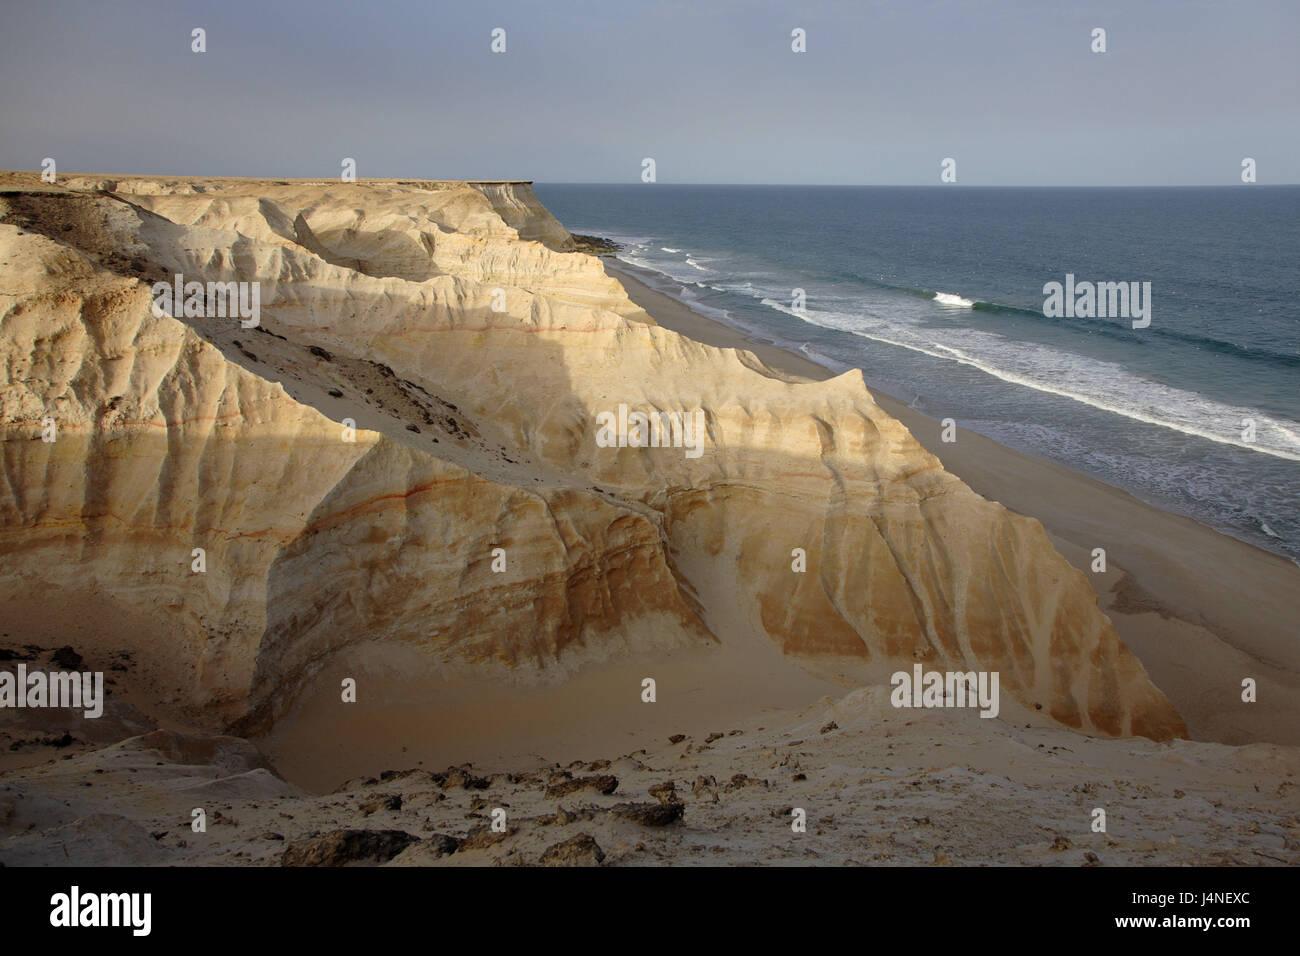 North Africa, Morocco, Western Sahara, formerly Spanish Sahara, Atlantic coast, - Stock Image